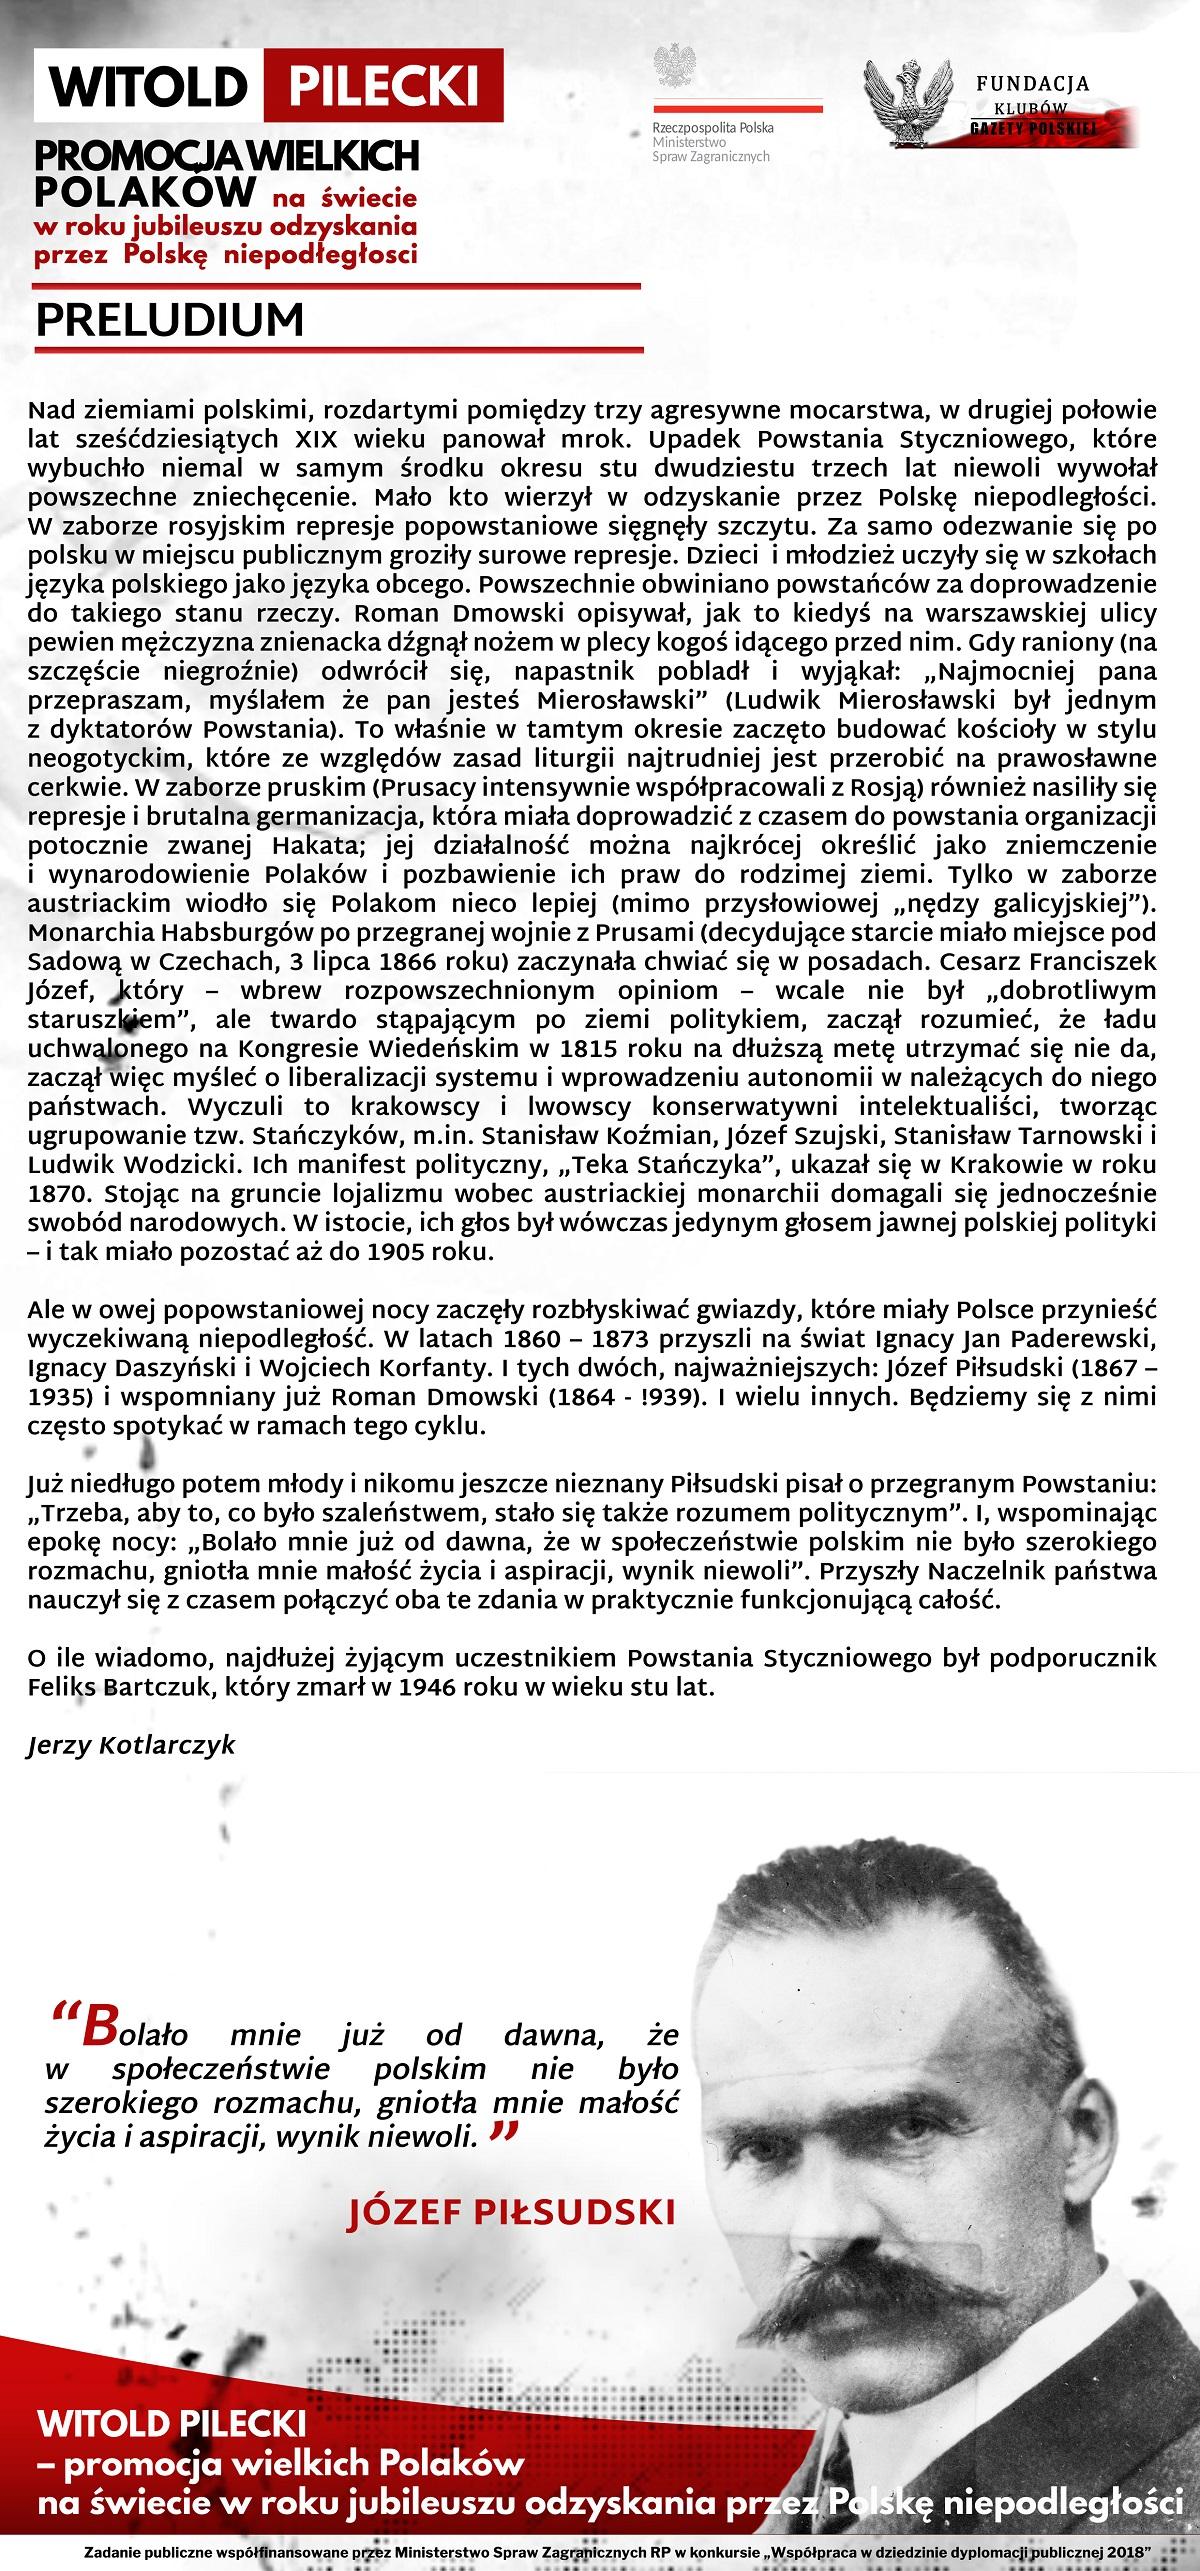 Artukul (1) J. Pilsudski